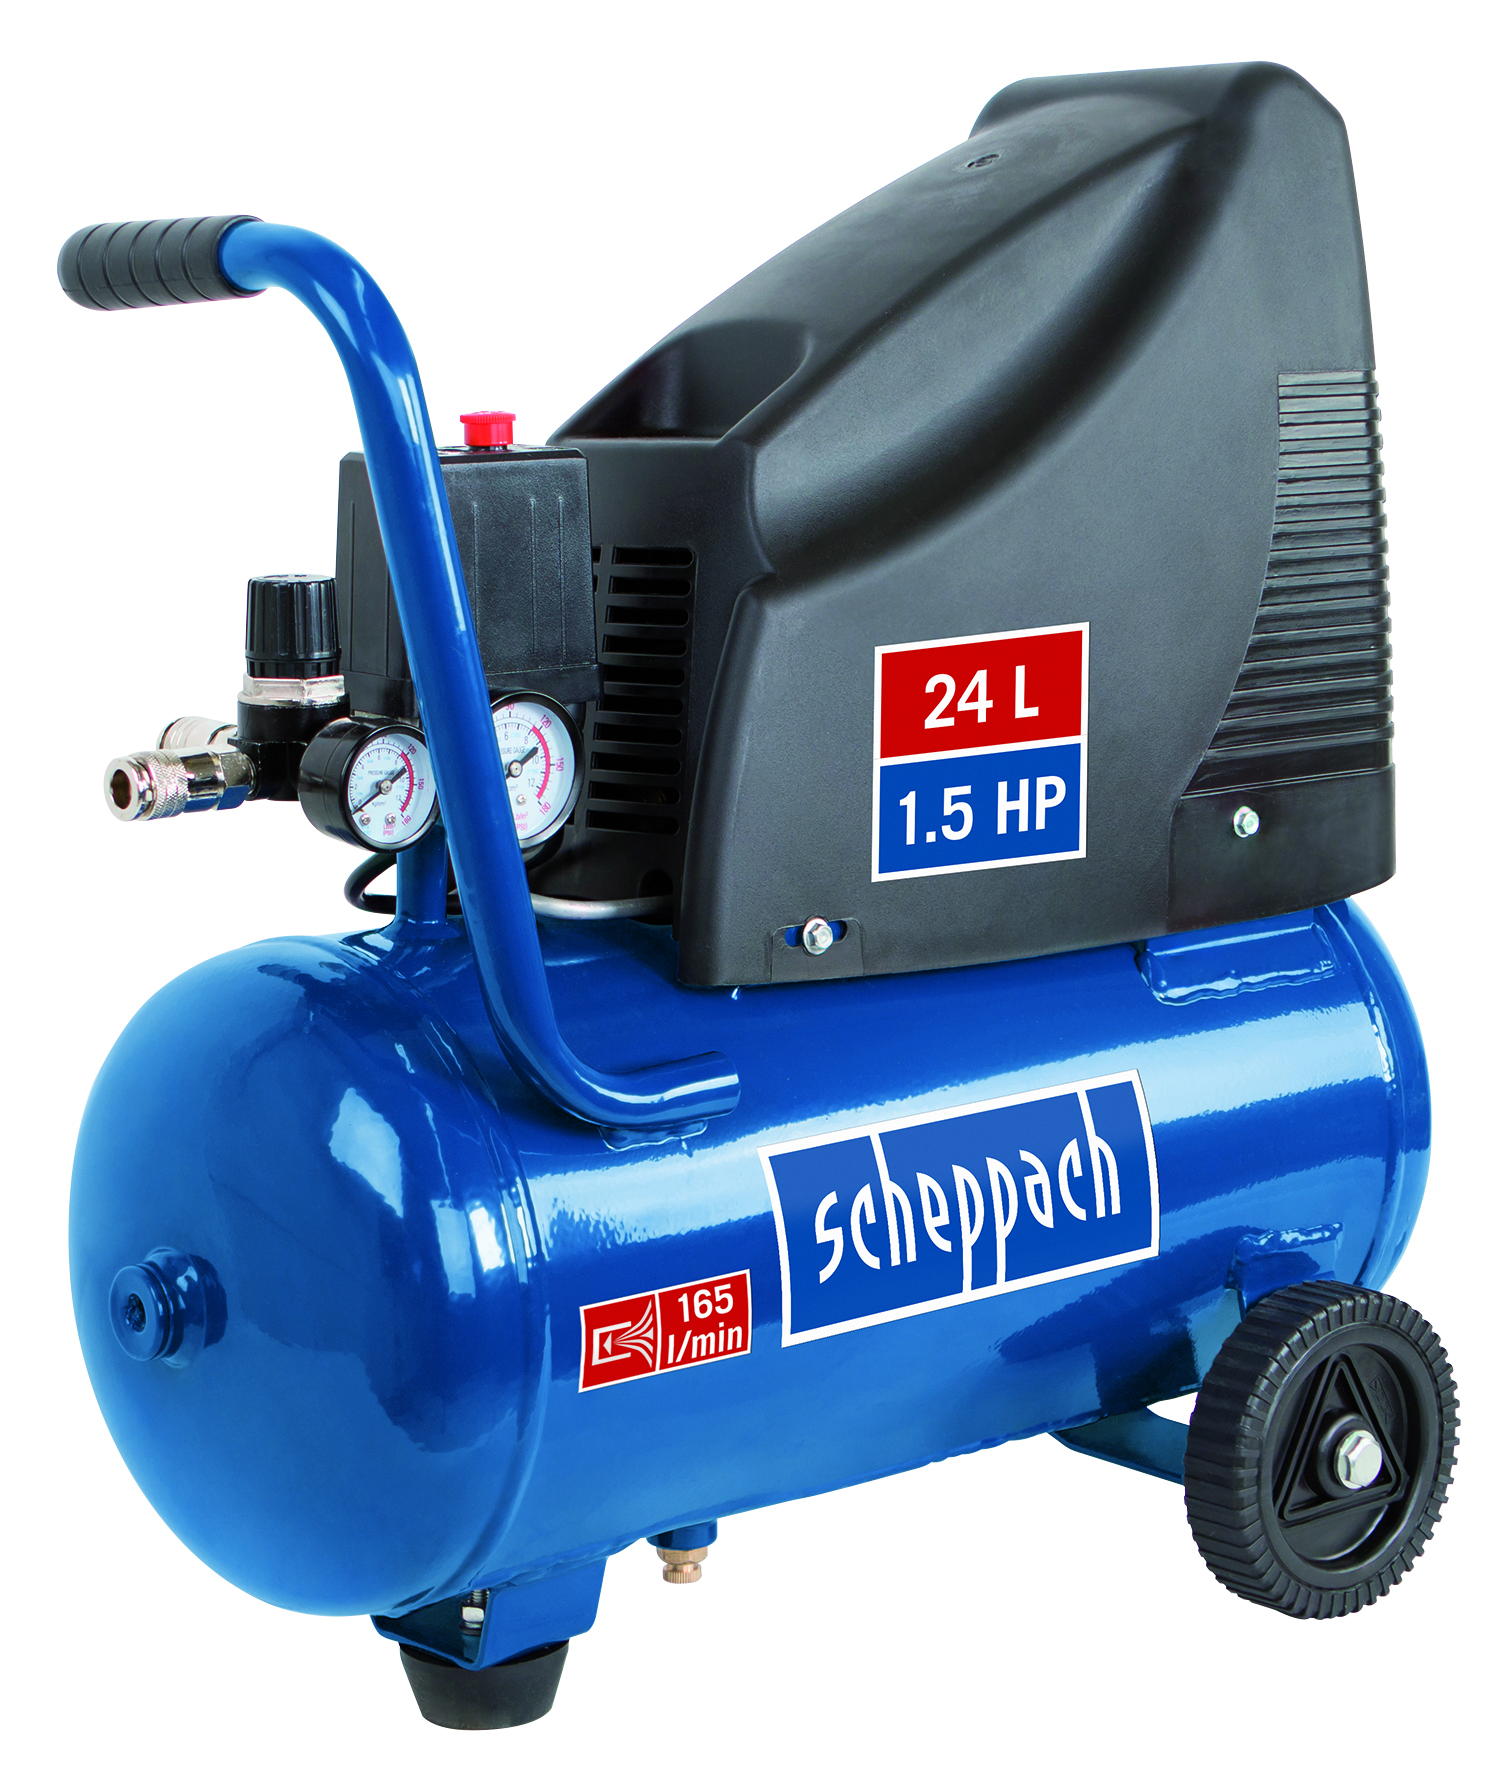 Scheppach HC 25o olajmentes kompresszor (1,1kW, 24l, 8bar)